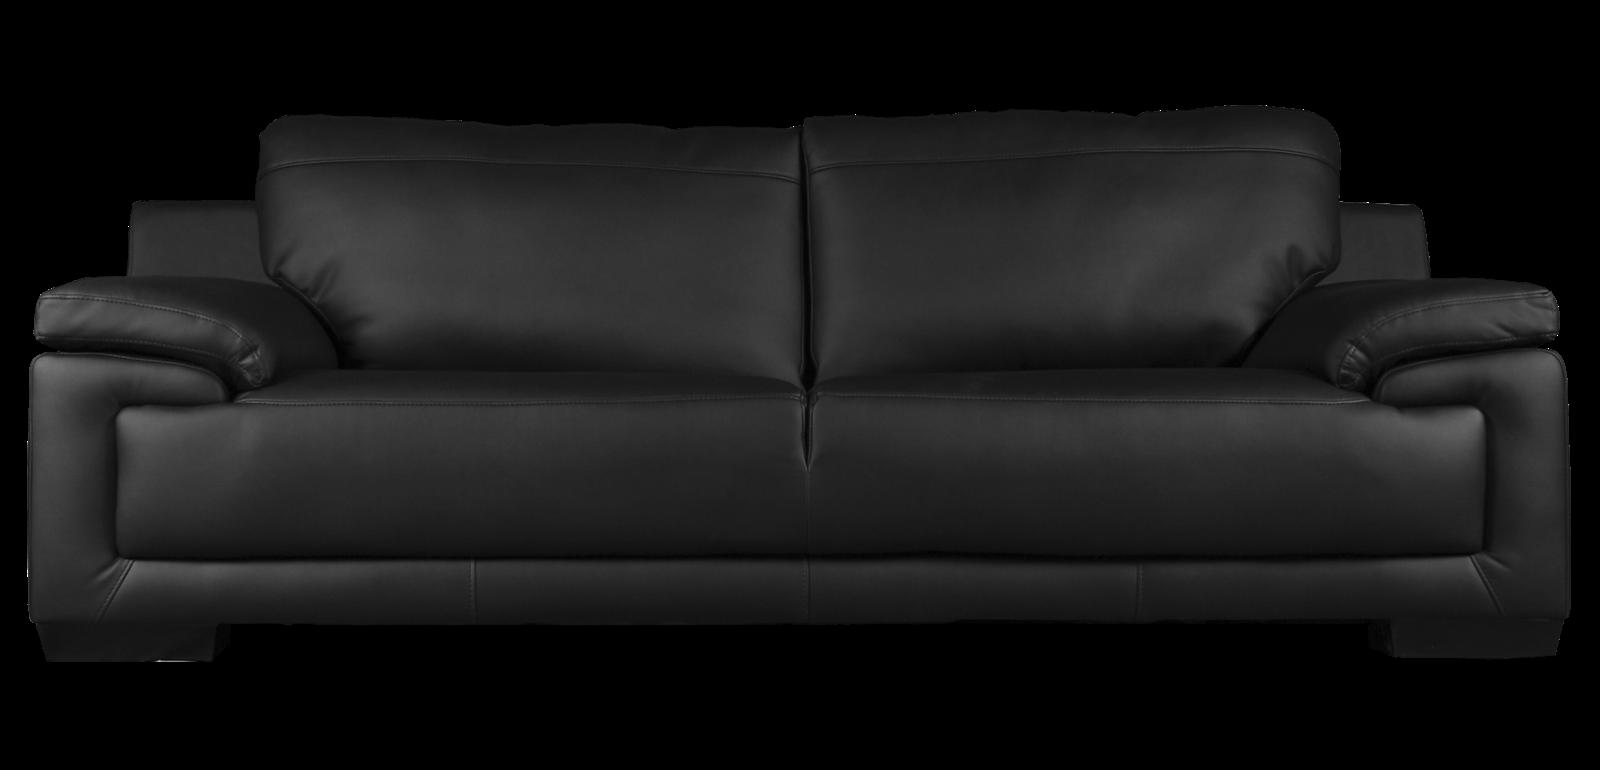 Sofa PNG Images Free Download